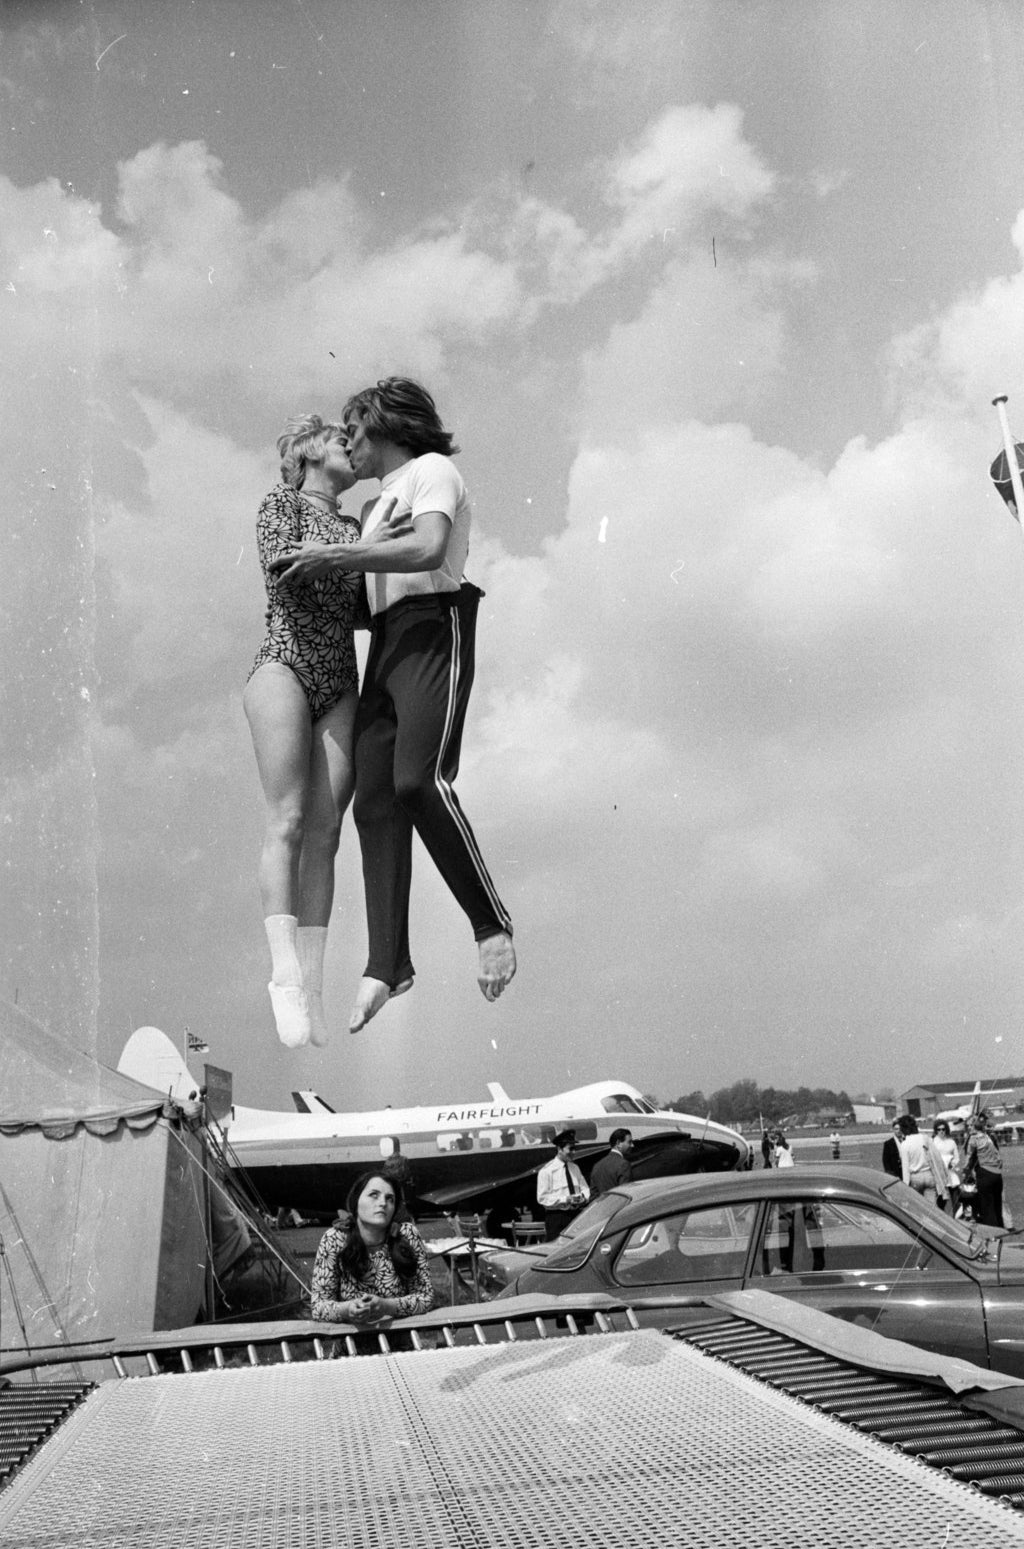 World trampolining champion Paul Luxon and his fiancee, German Ladies Champion Ute Czech. May 1973